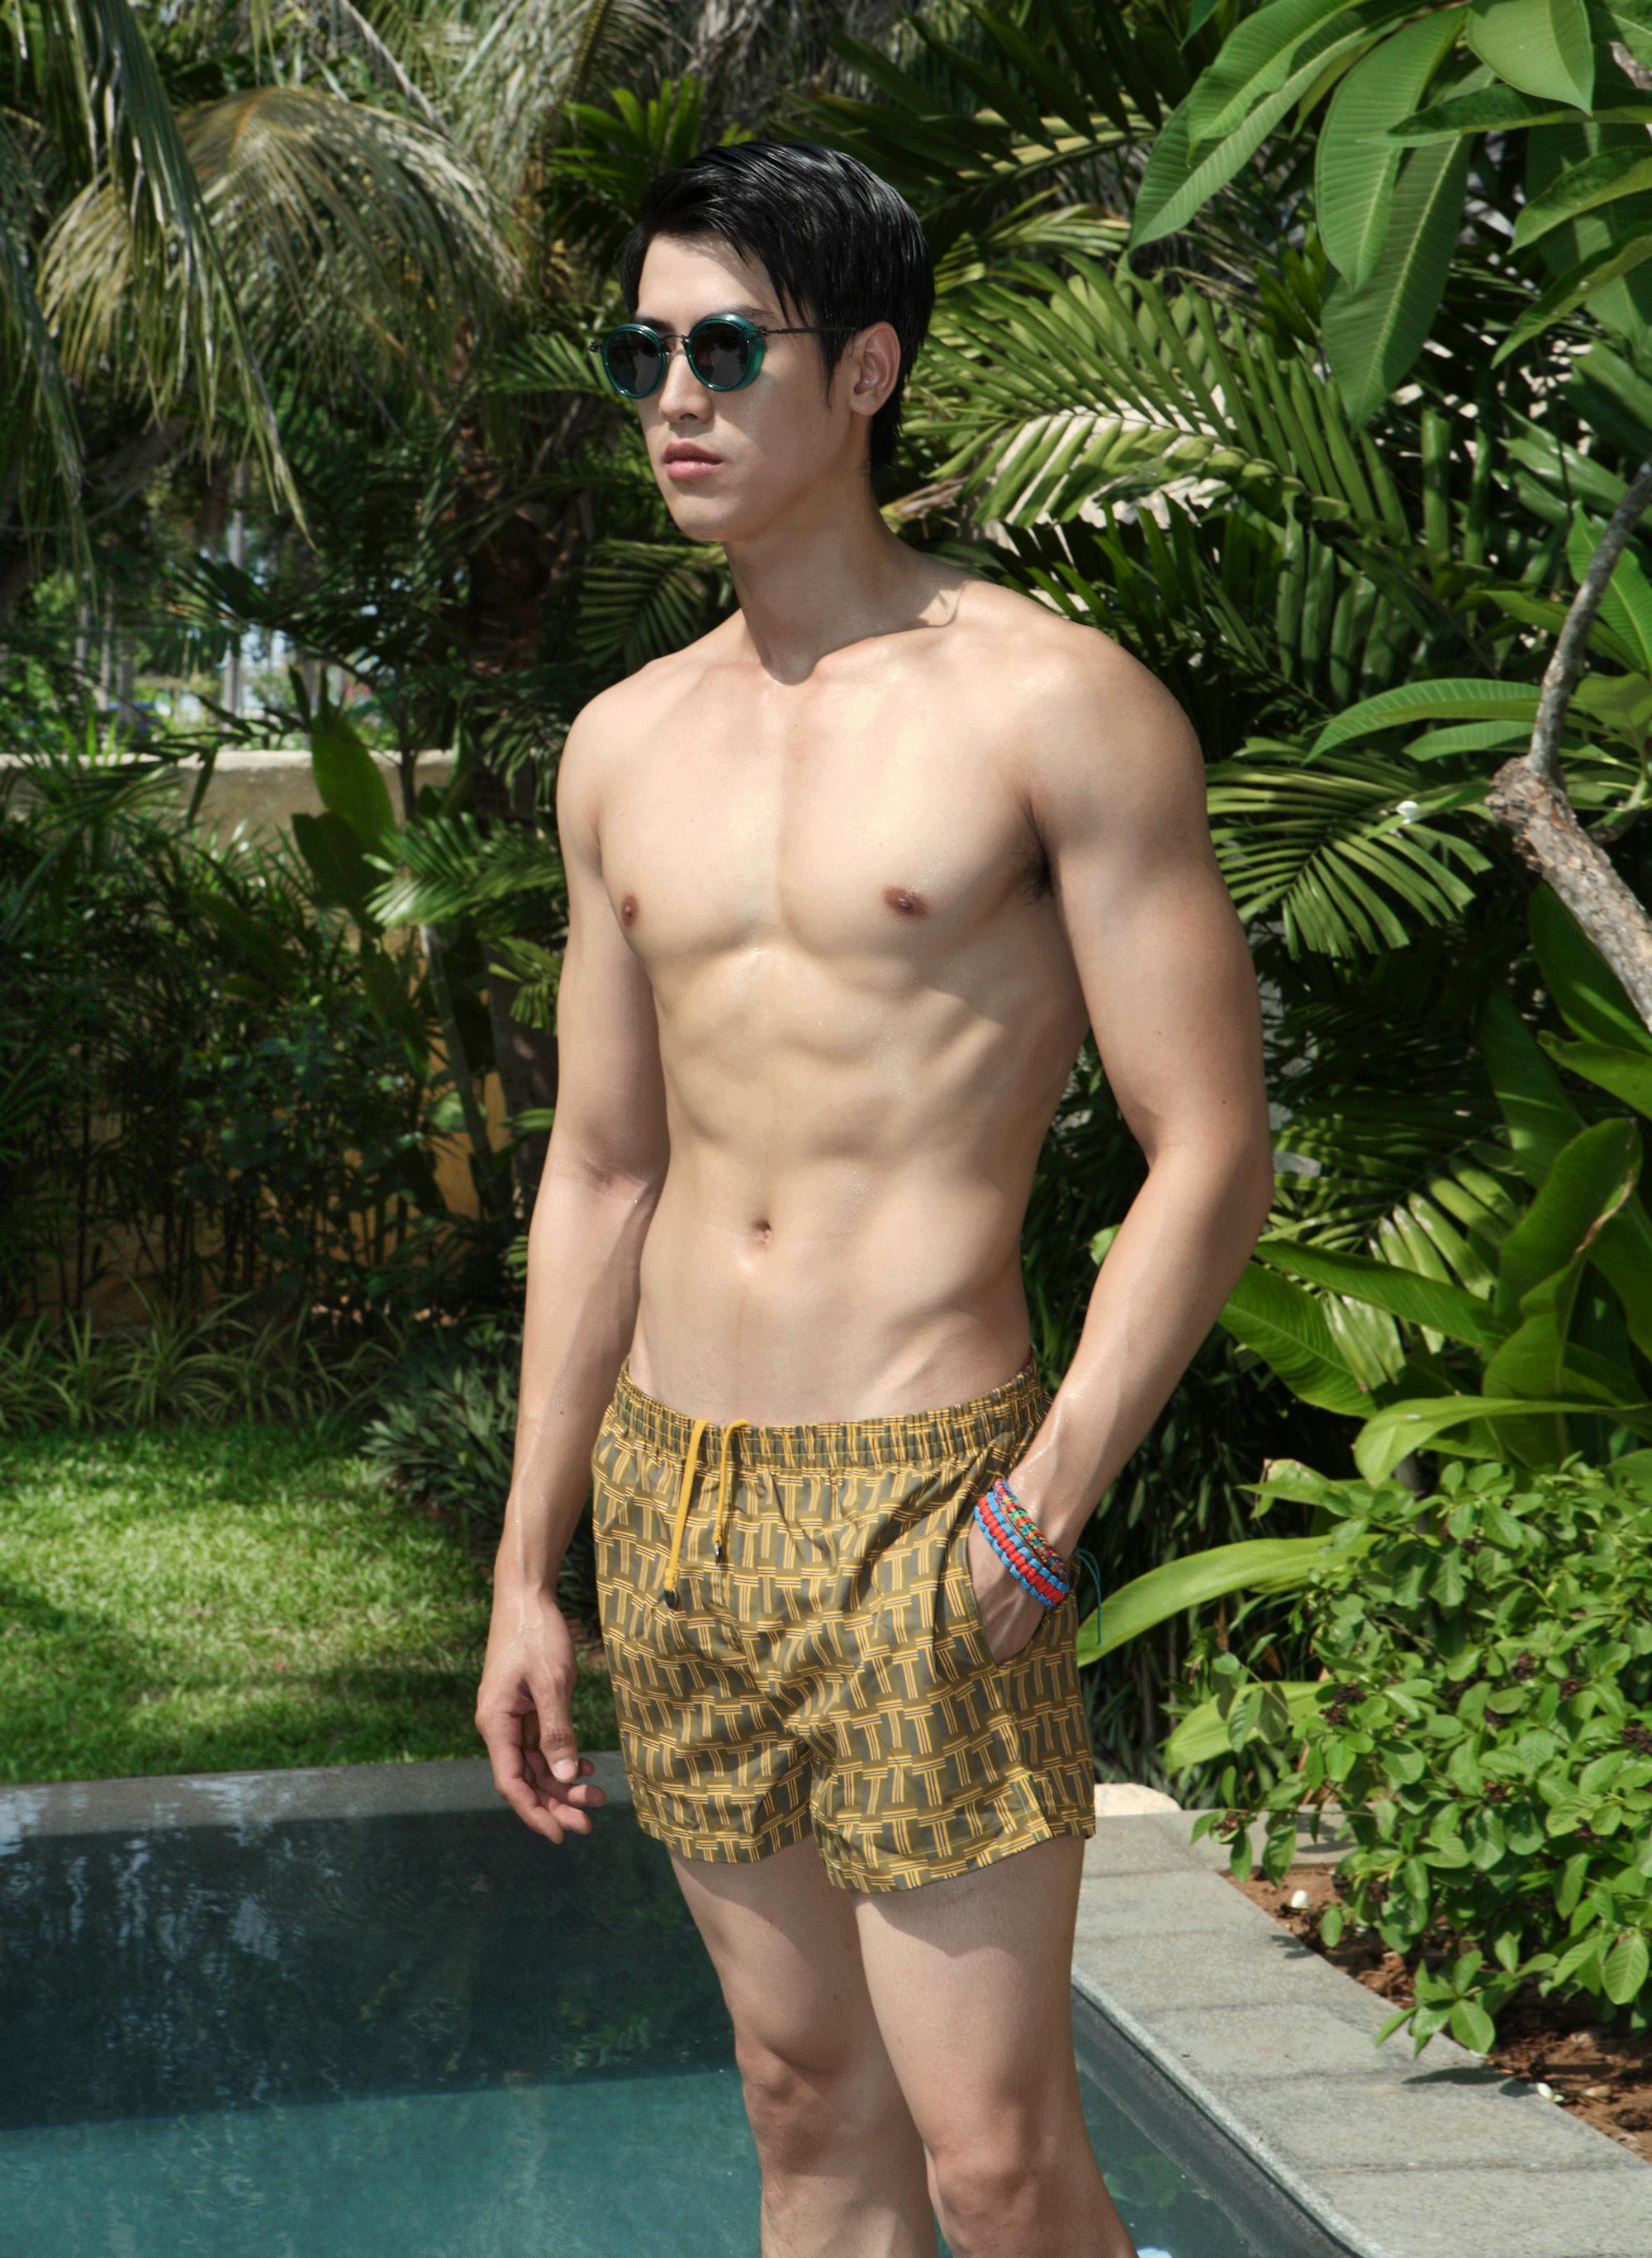 trunks : TIMO / sunglasses : TAVAT